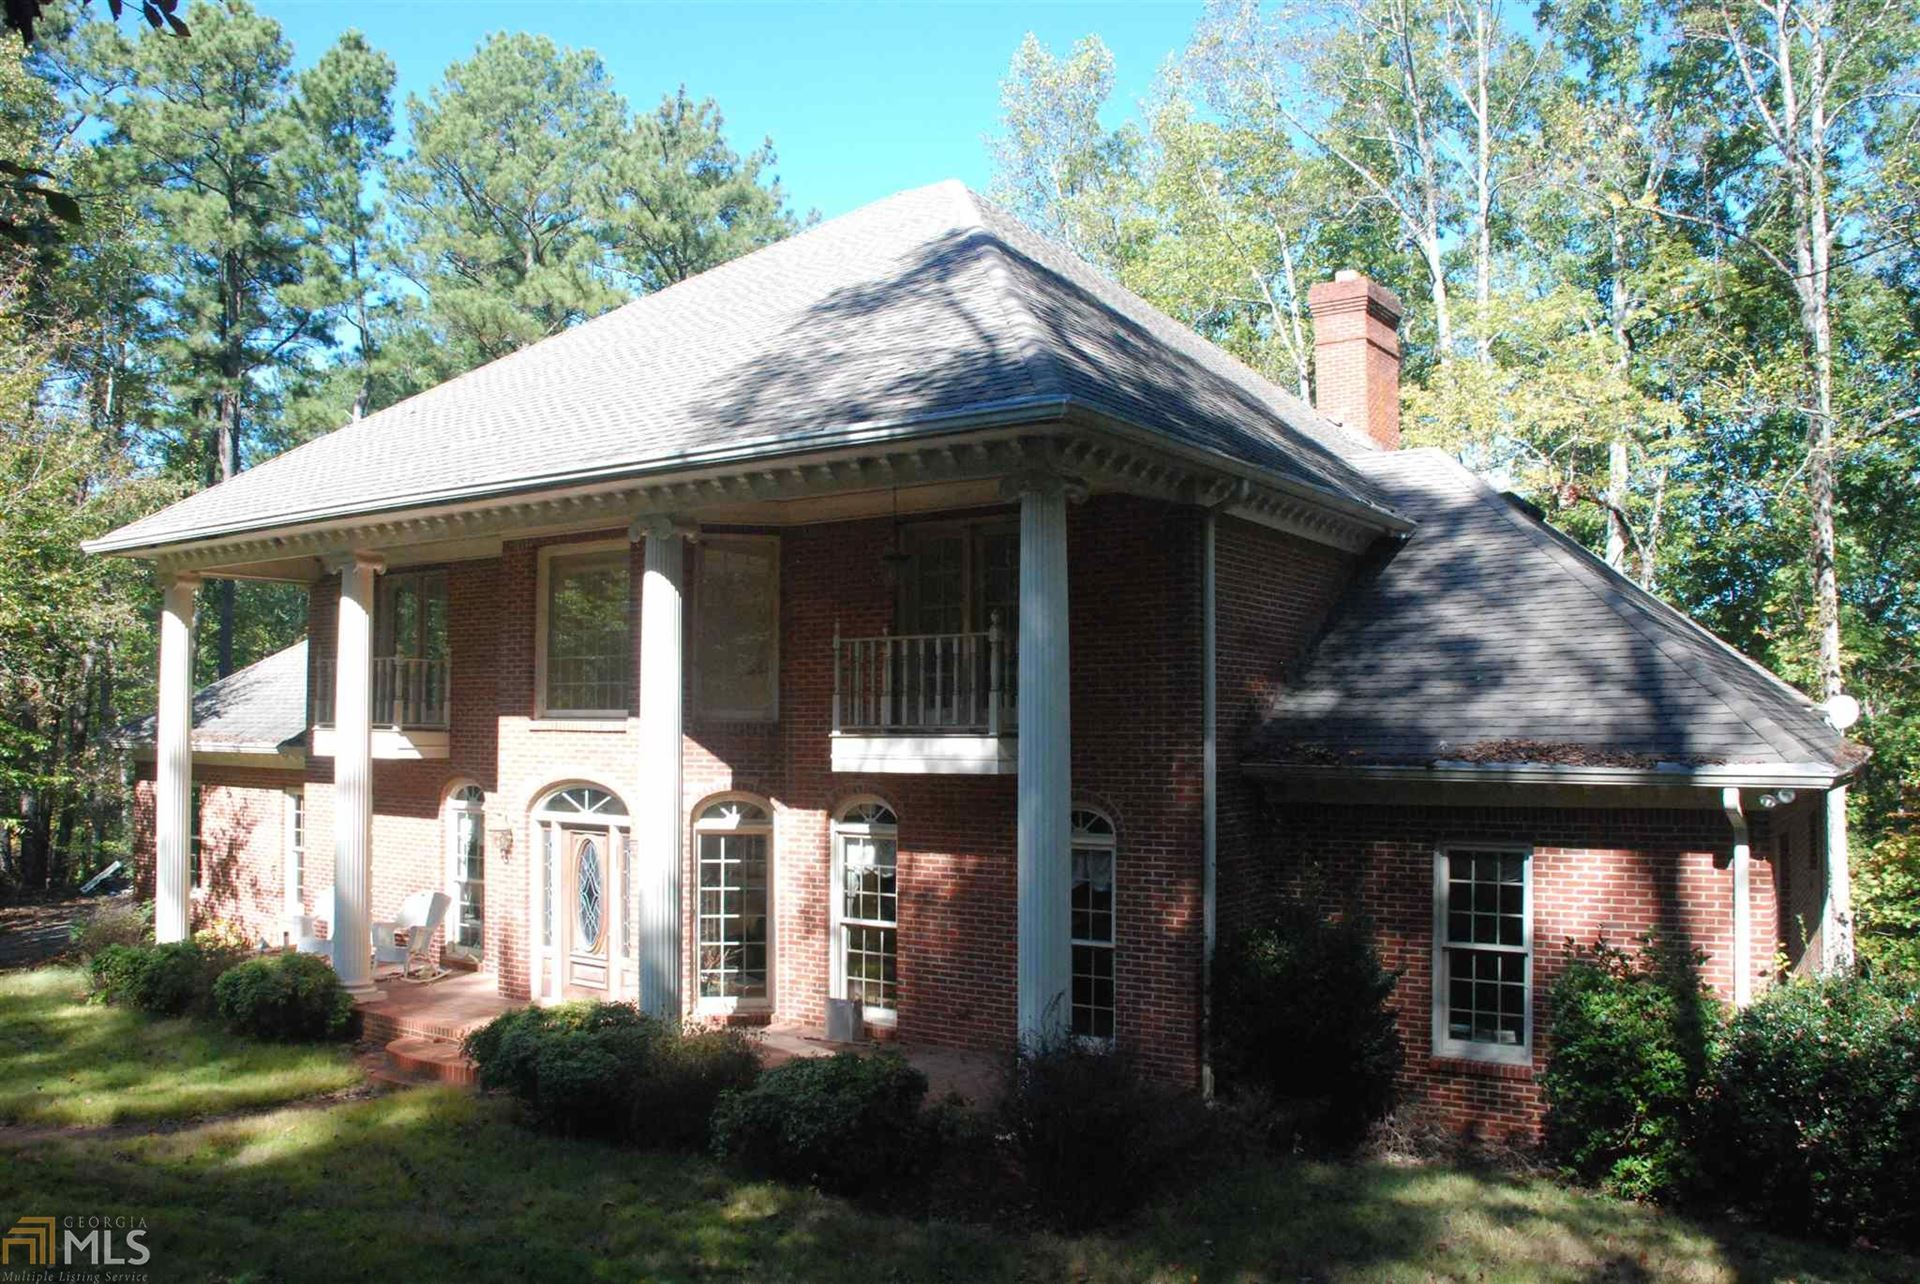 1377 Arbor Hill Rd, Canton, GA 30115 - MLS#: 8698142